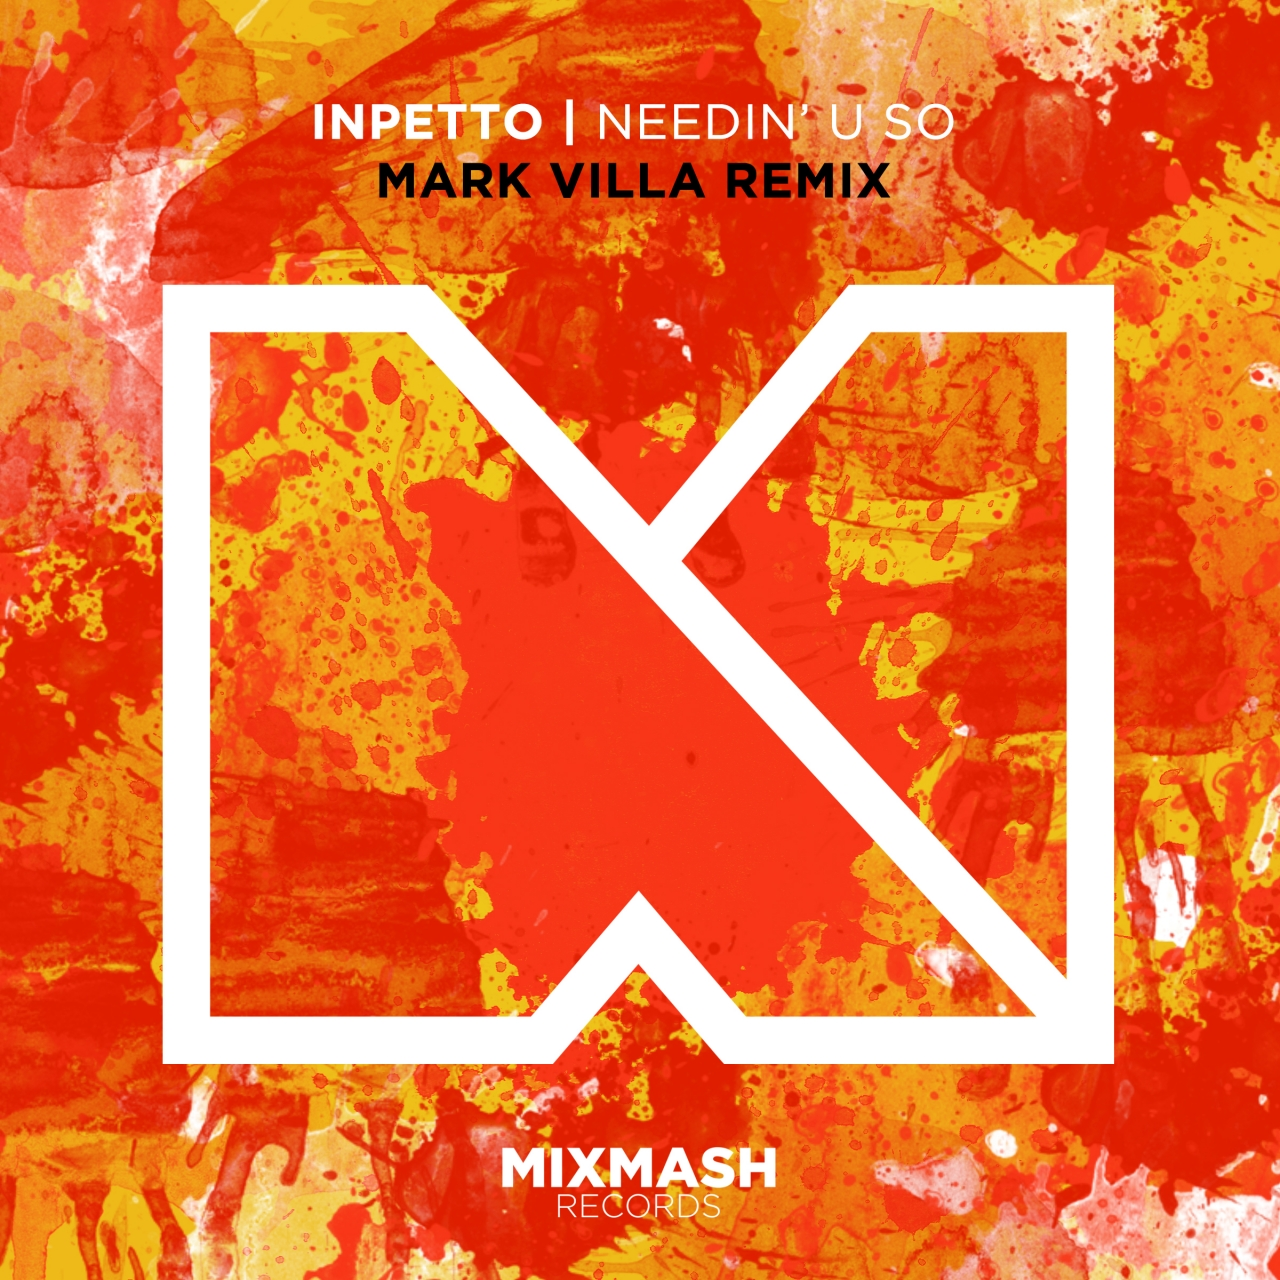 Needin' U So (Mark Villa Remix)